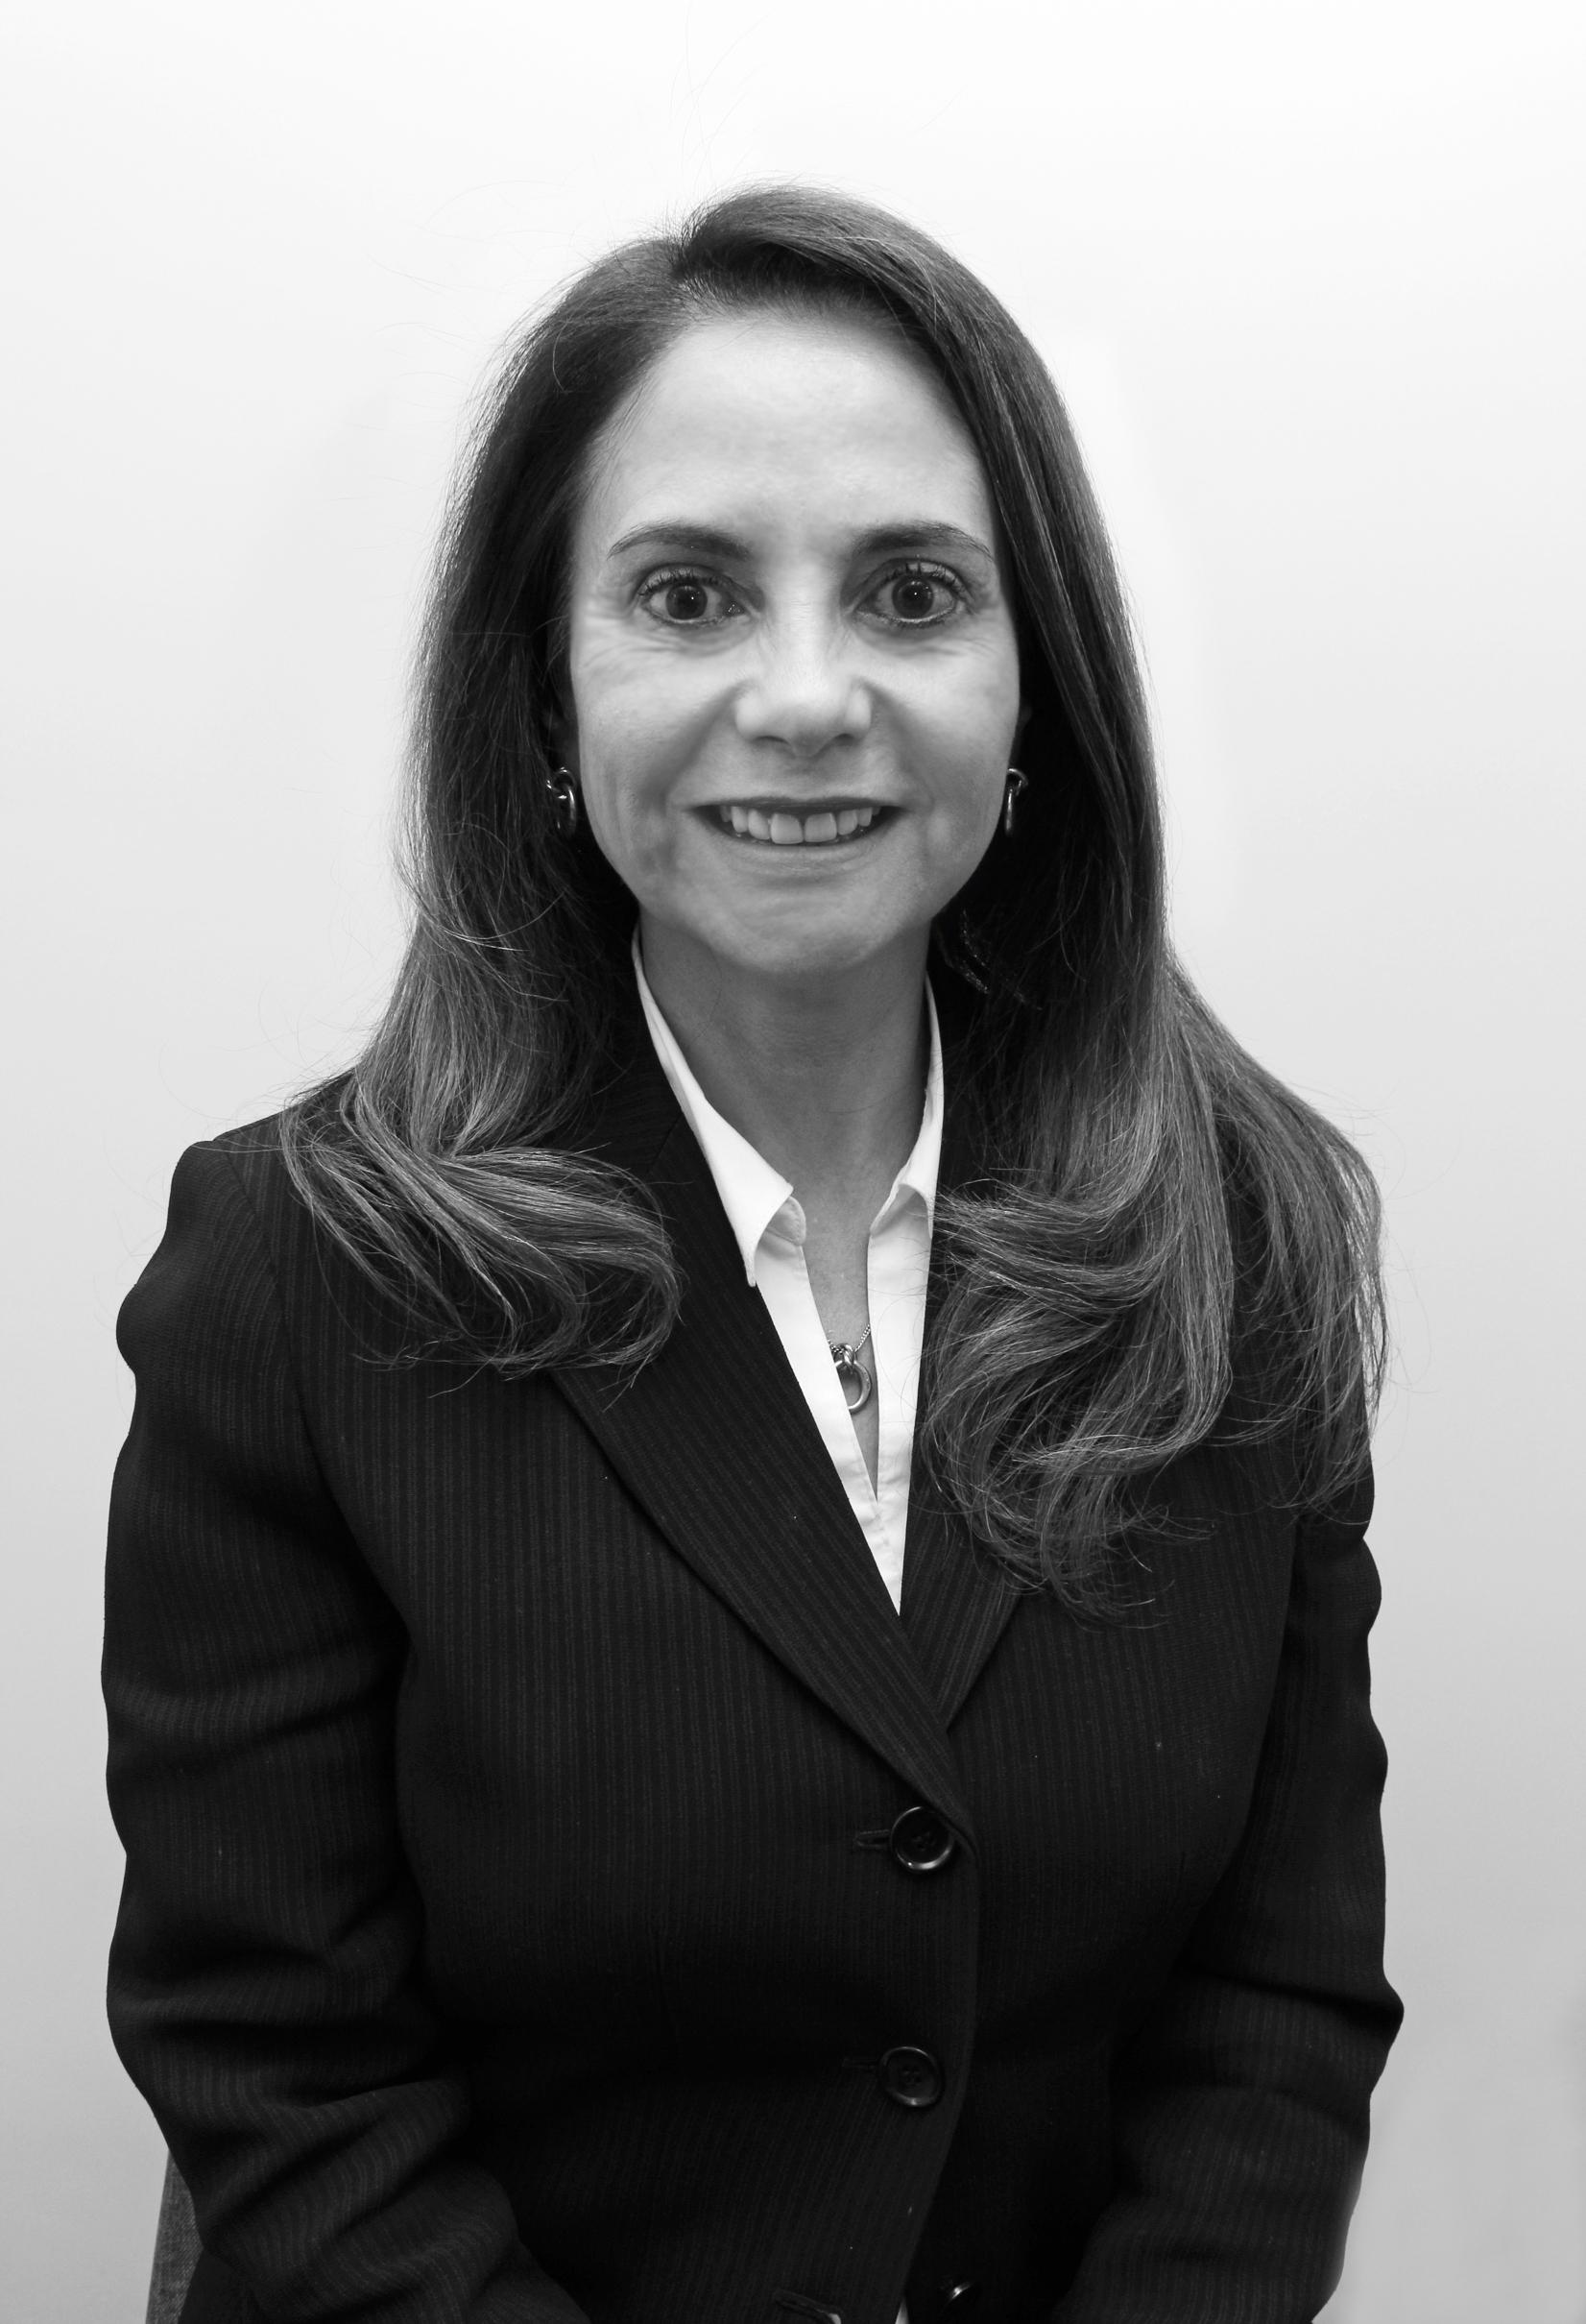 Elsa Gonzalez